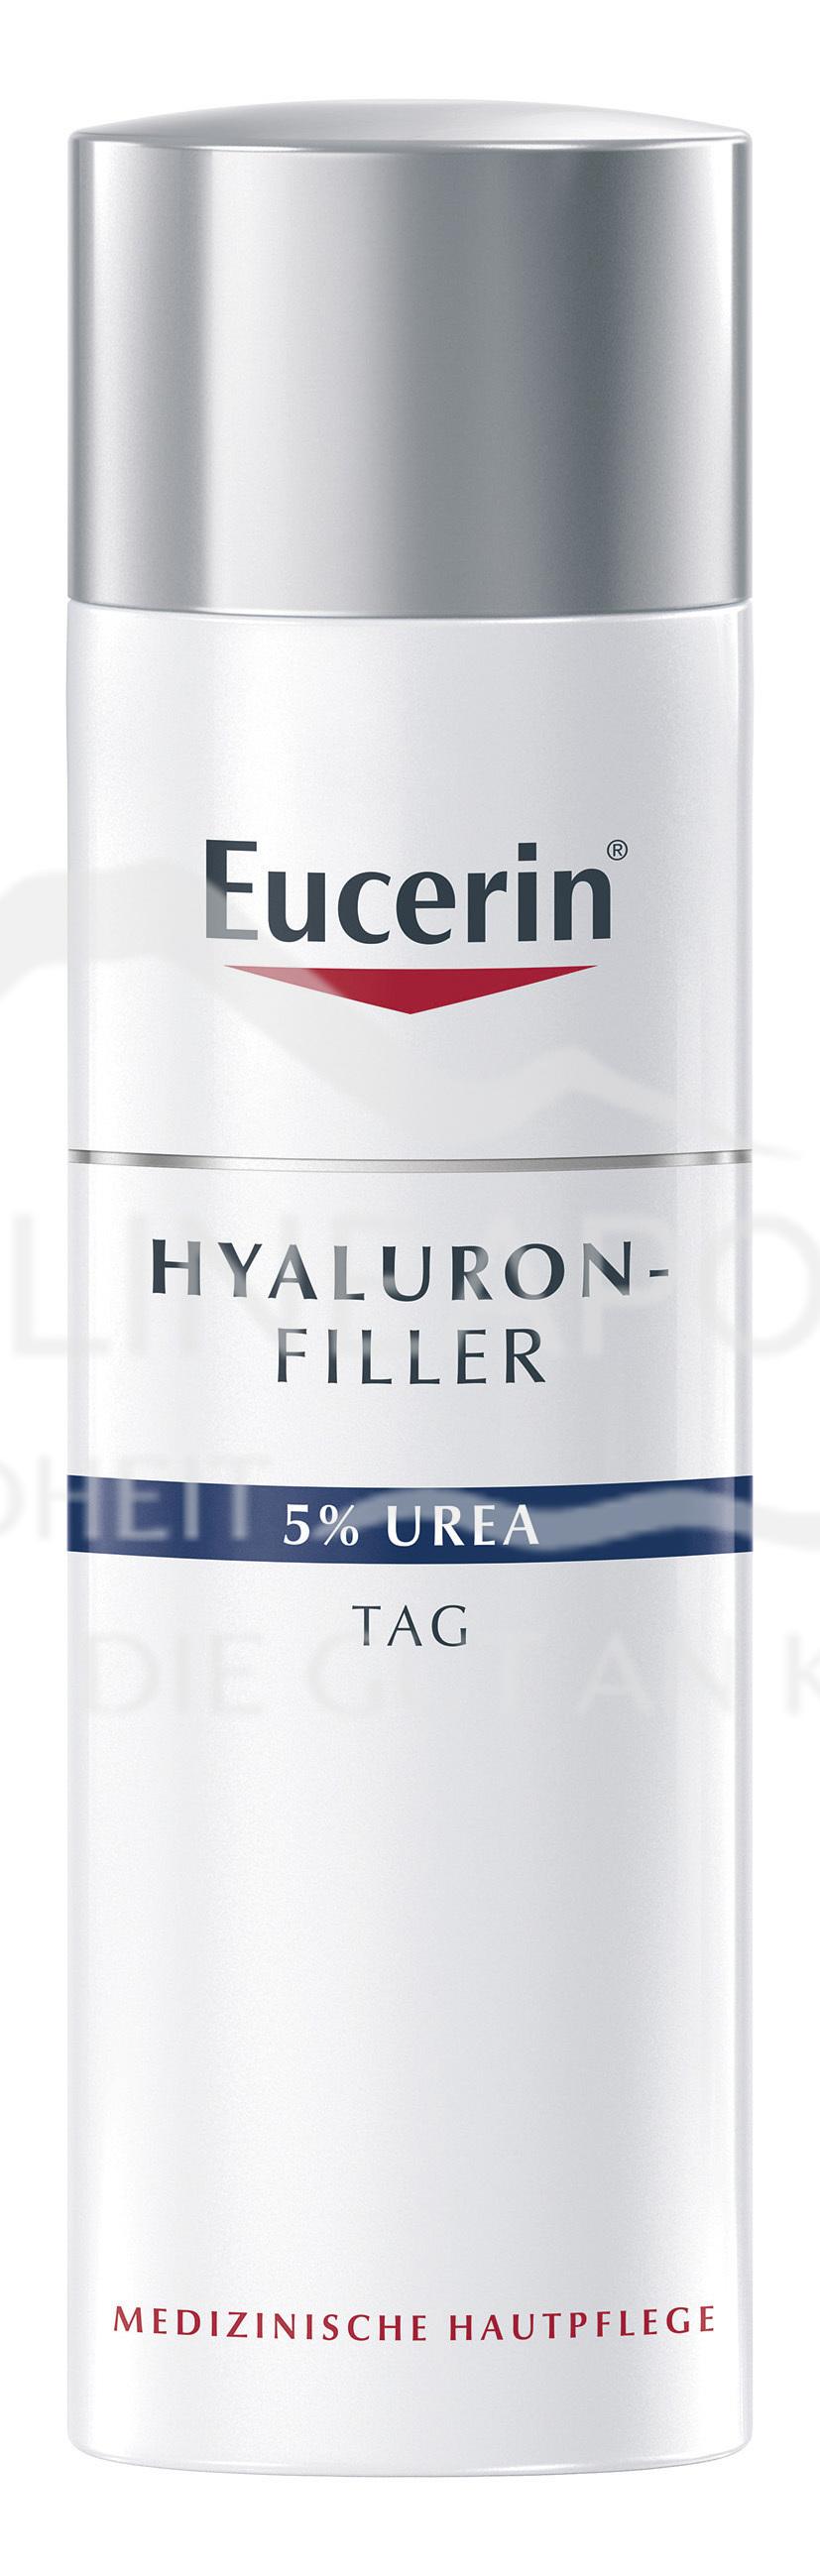 Eucerin Hyal-Urea ANTI-FALTEN Tagespflege